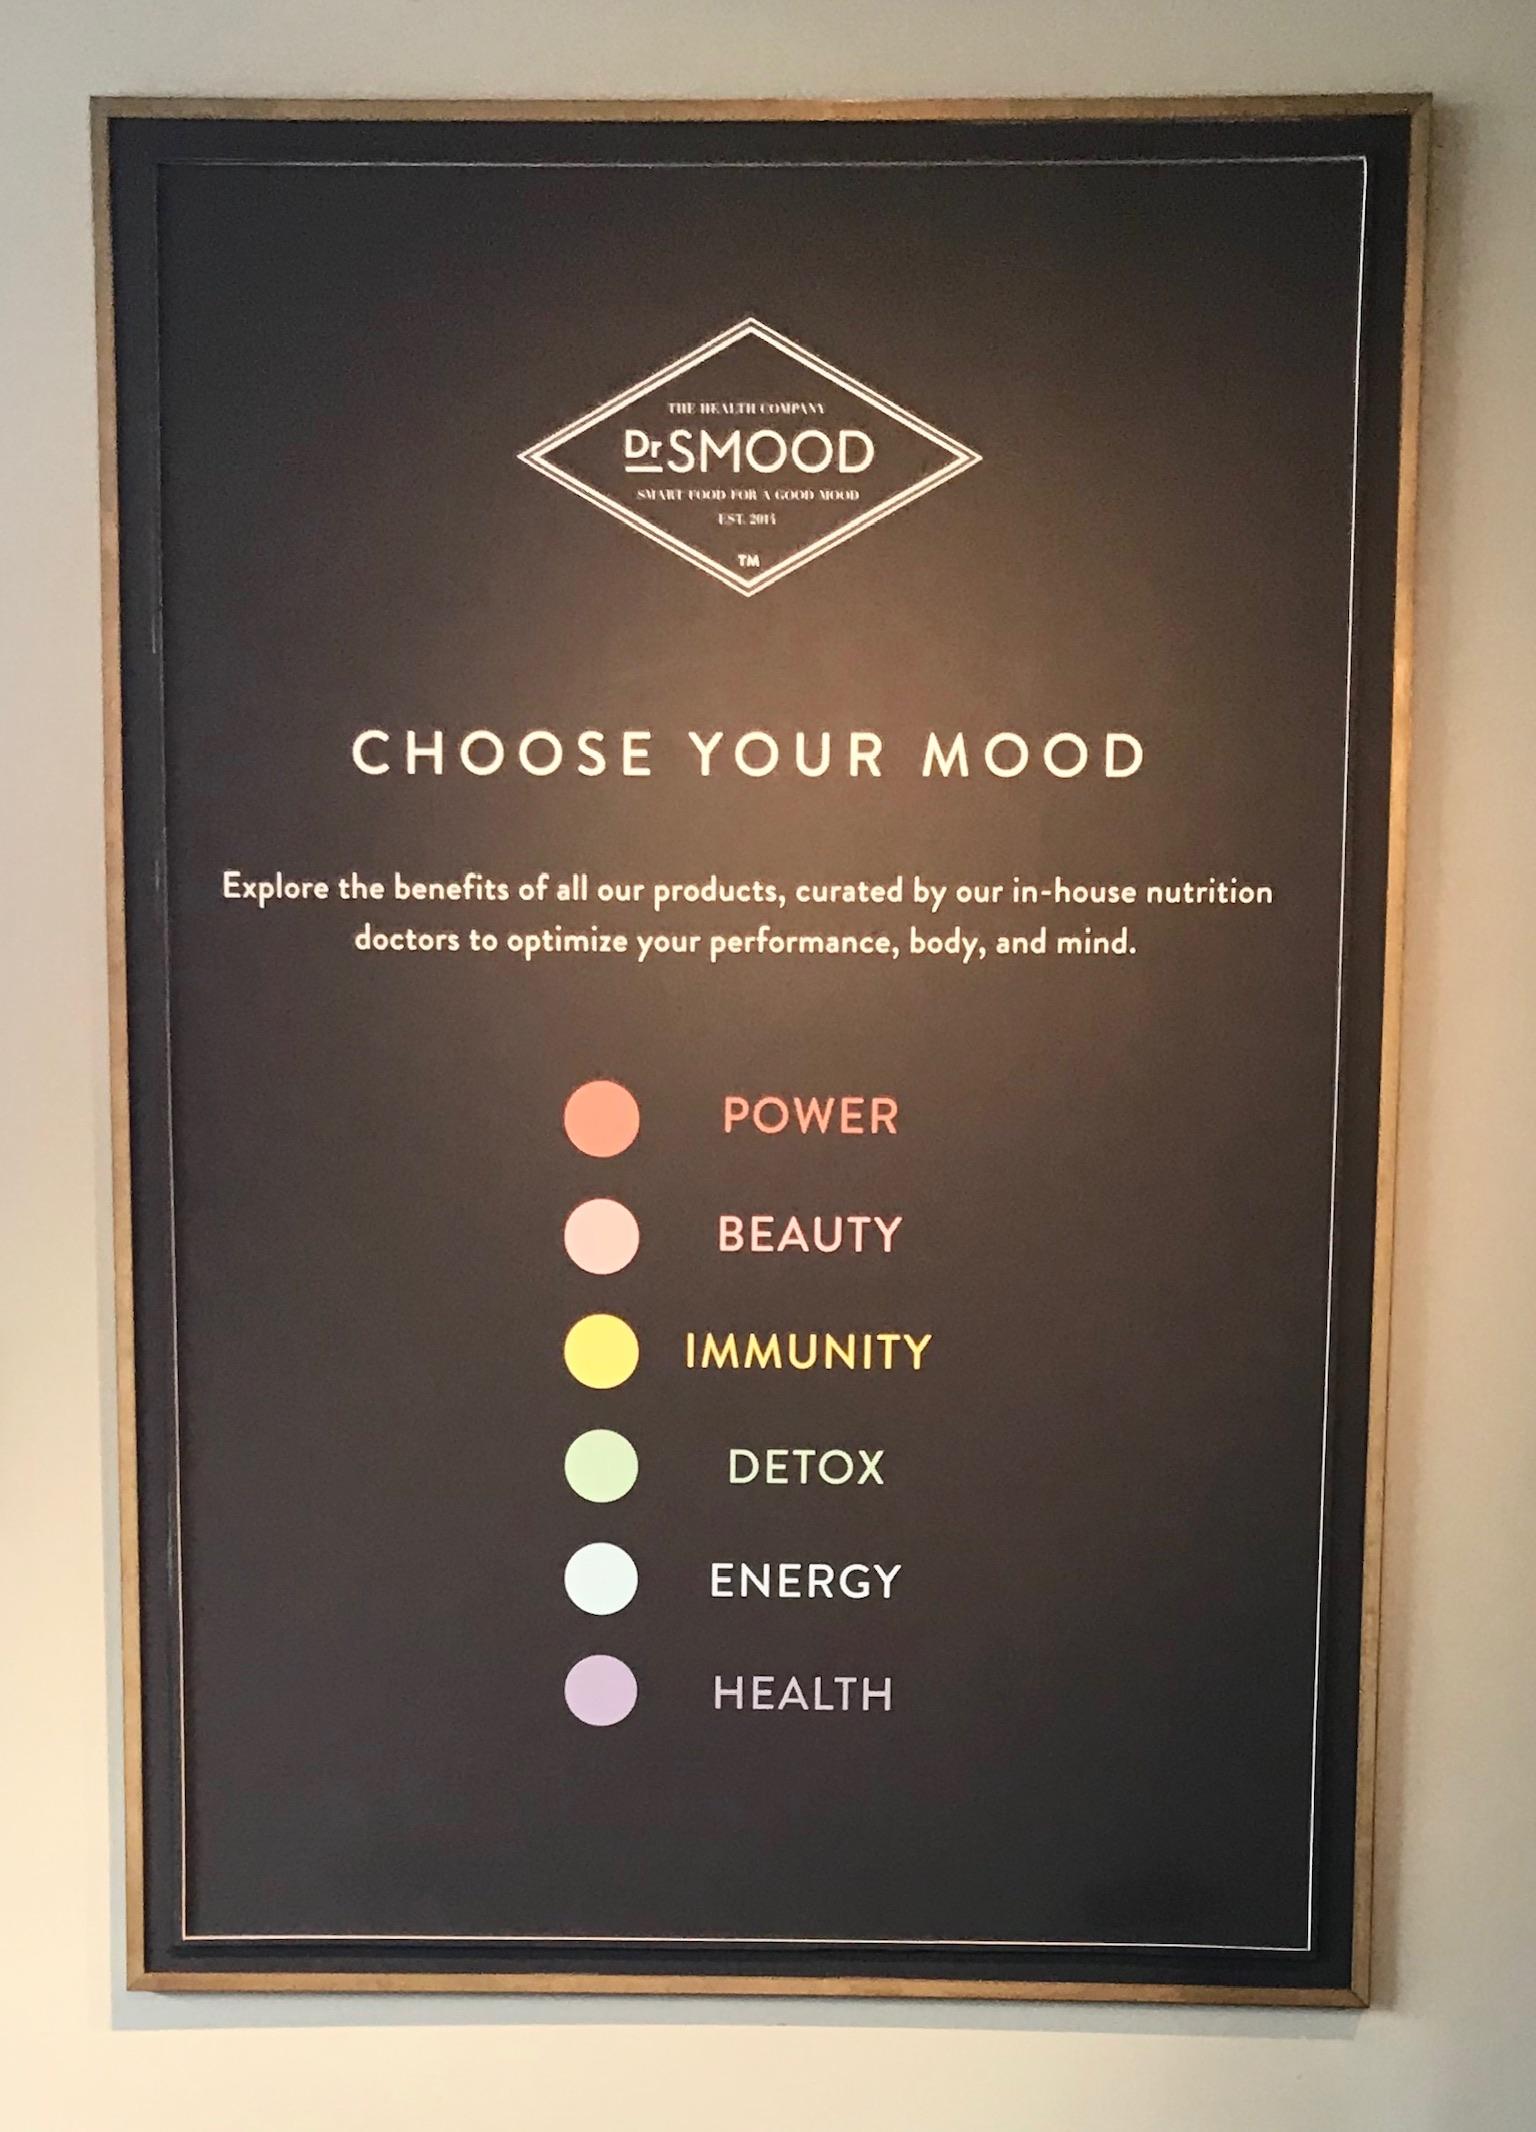 Dr Smood's Moods